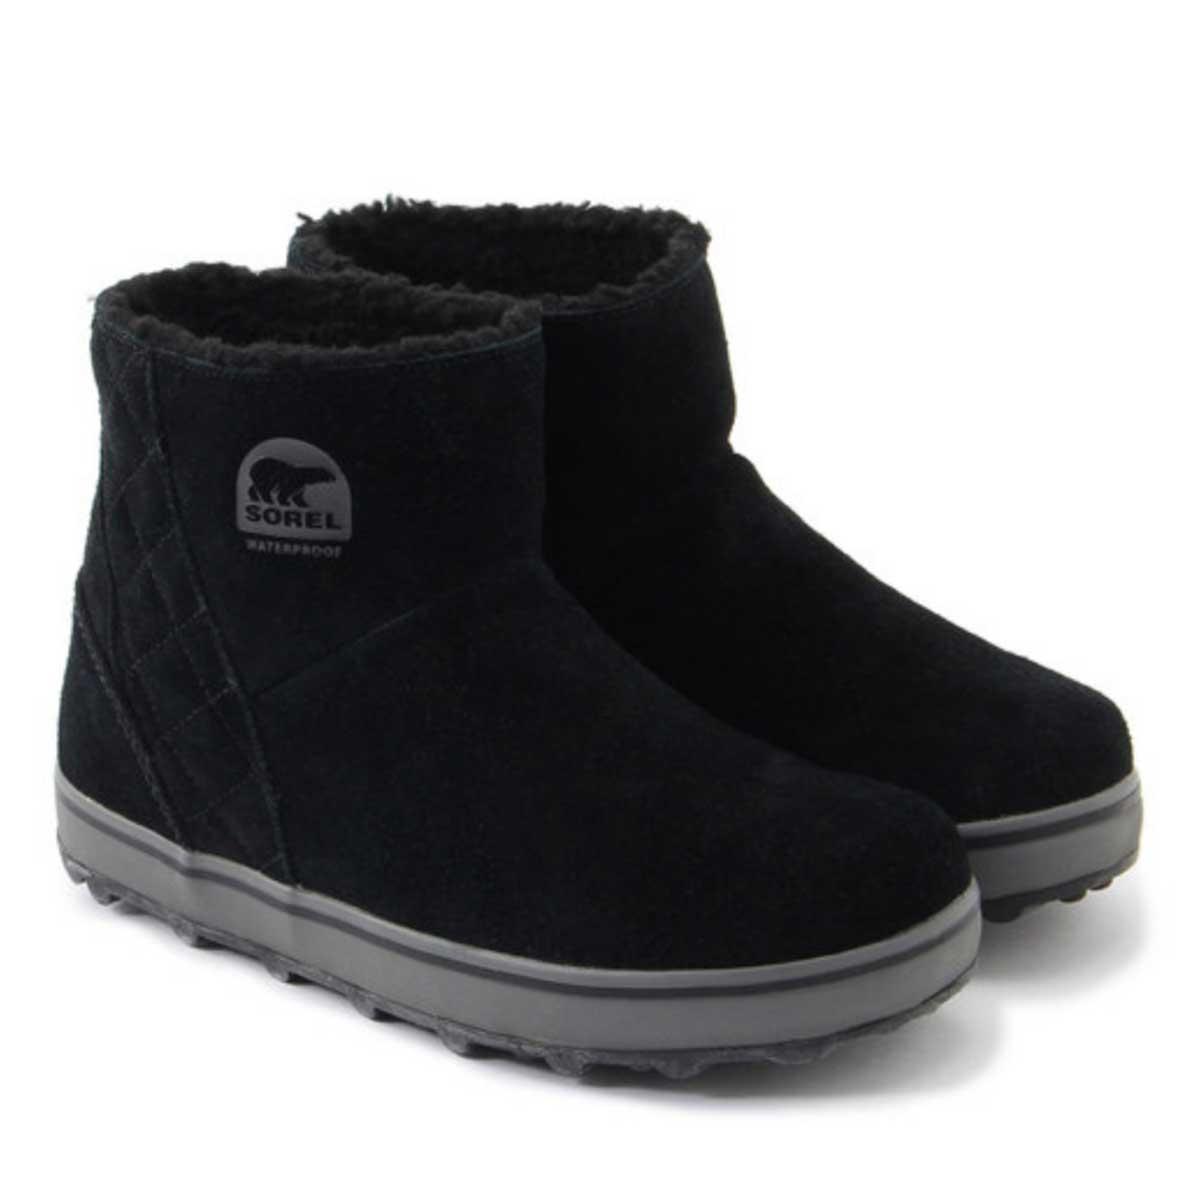 SOREL ソレル LL 5195 ブラック(010) グレイシーショート(レディース)「靴」